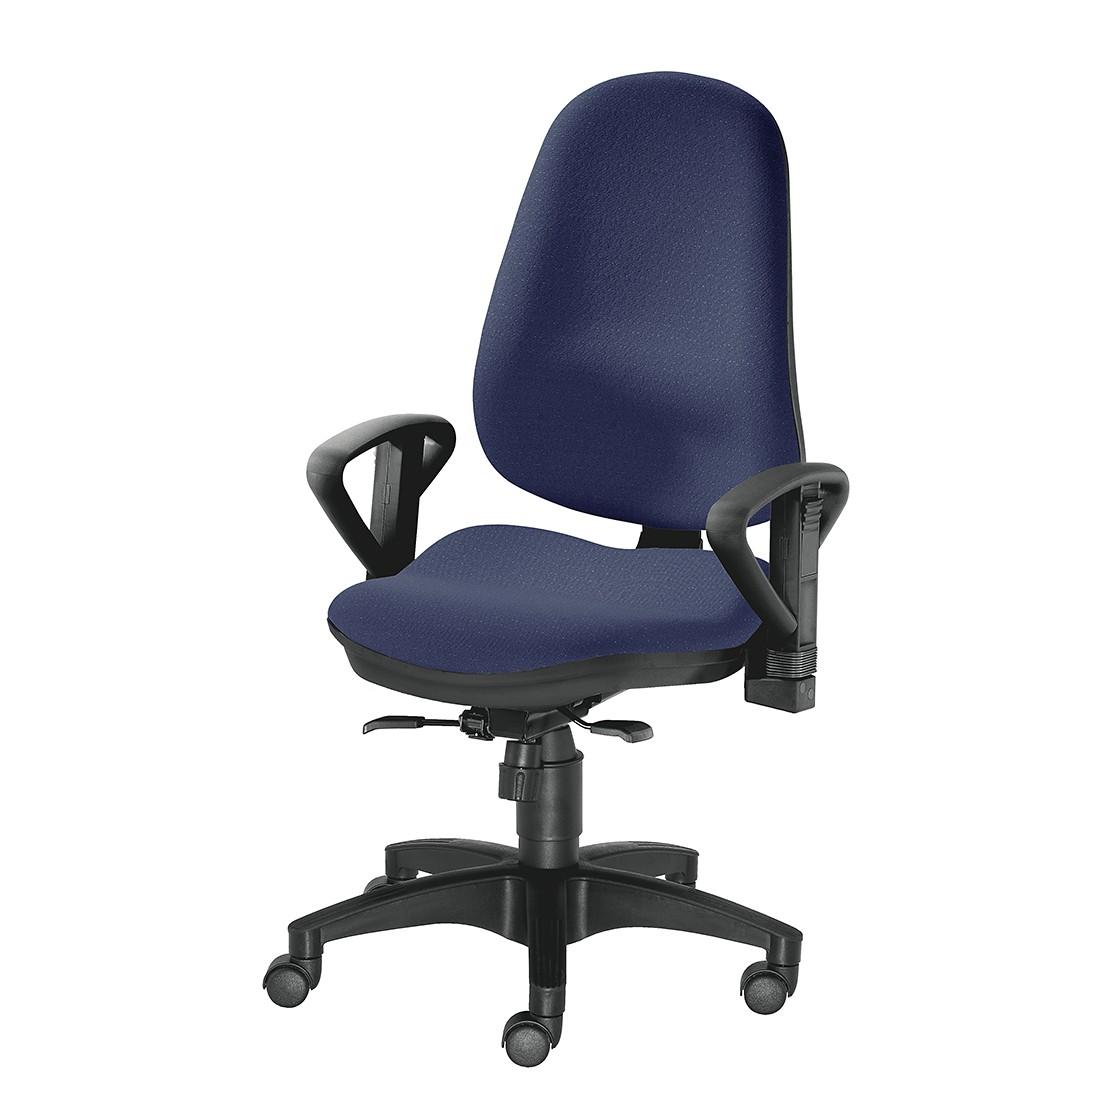 Bürodrehstuhl Ultra 1000 – Höhenverstellbare Armlehnen – Dunkelblau, 1000 Stühle Gernot-M. Steifensand günstig kaufen